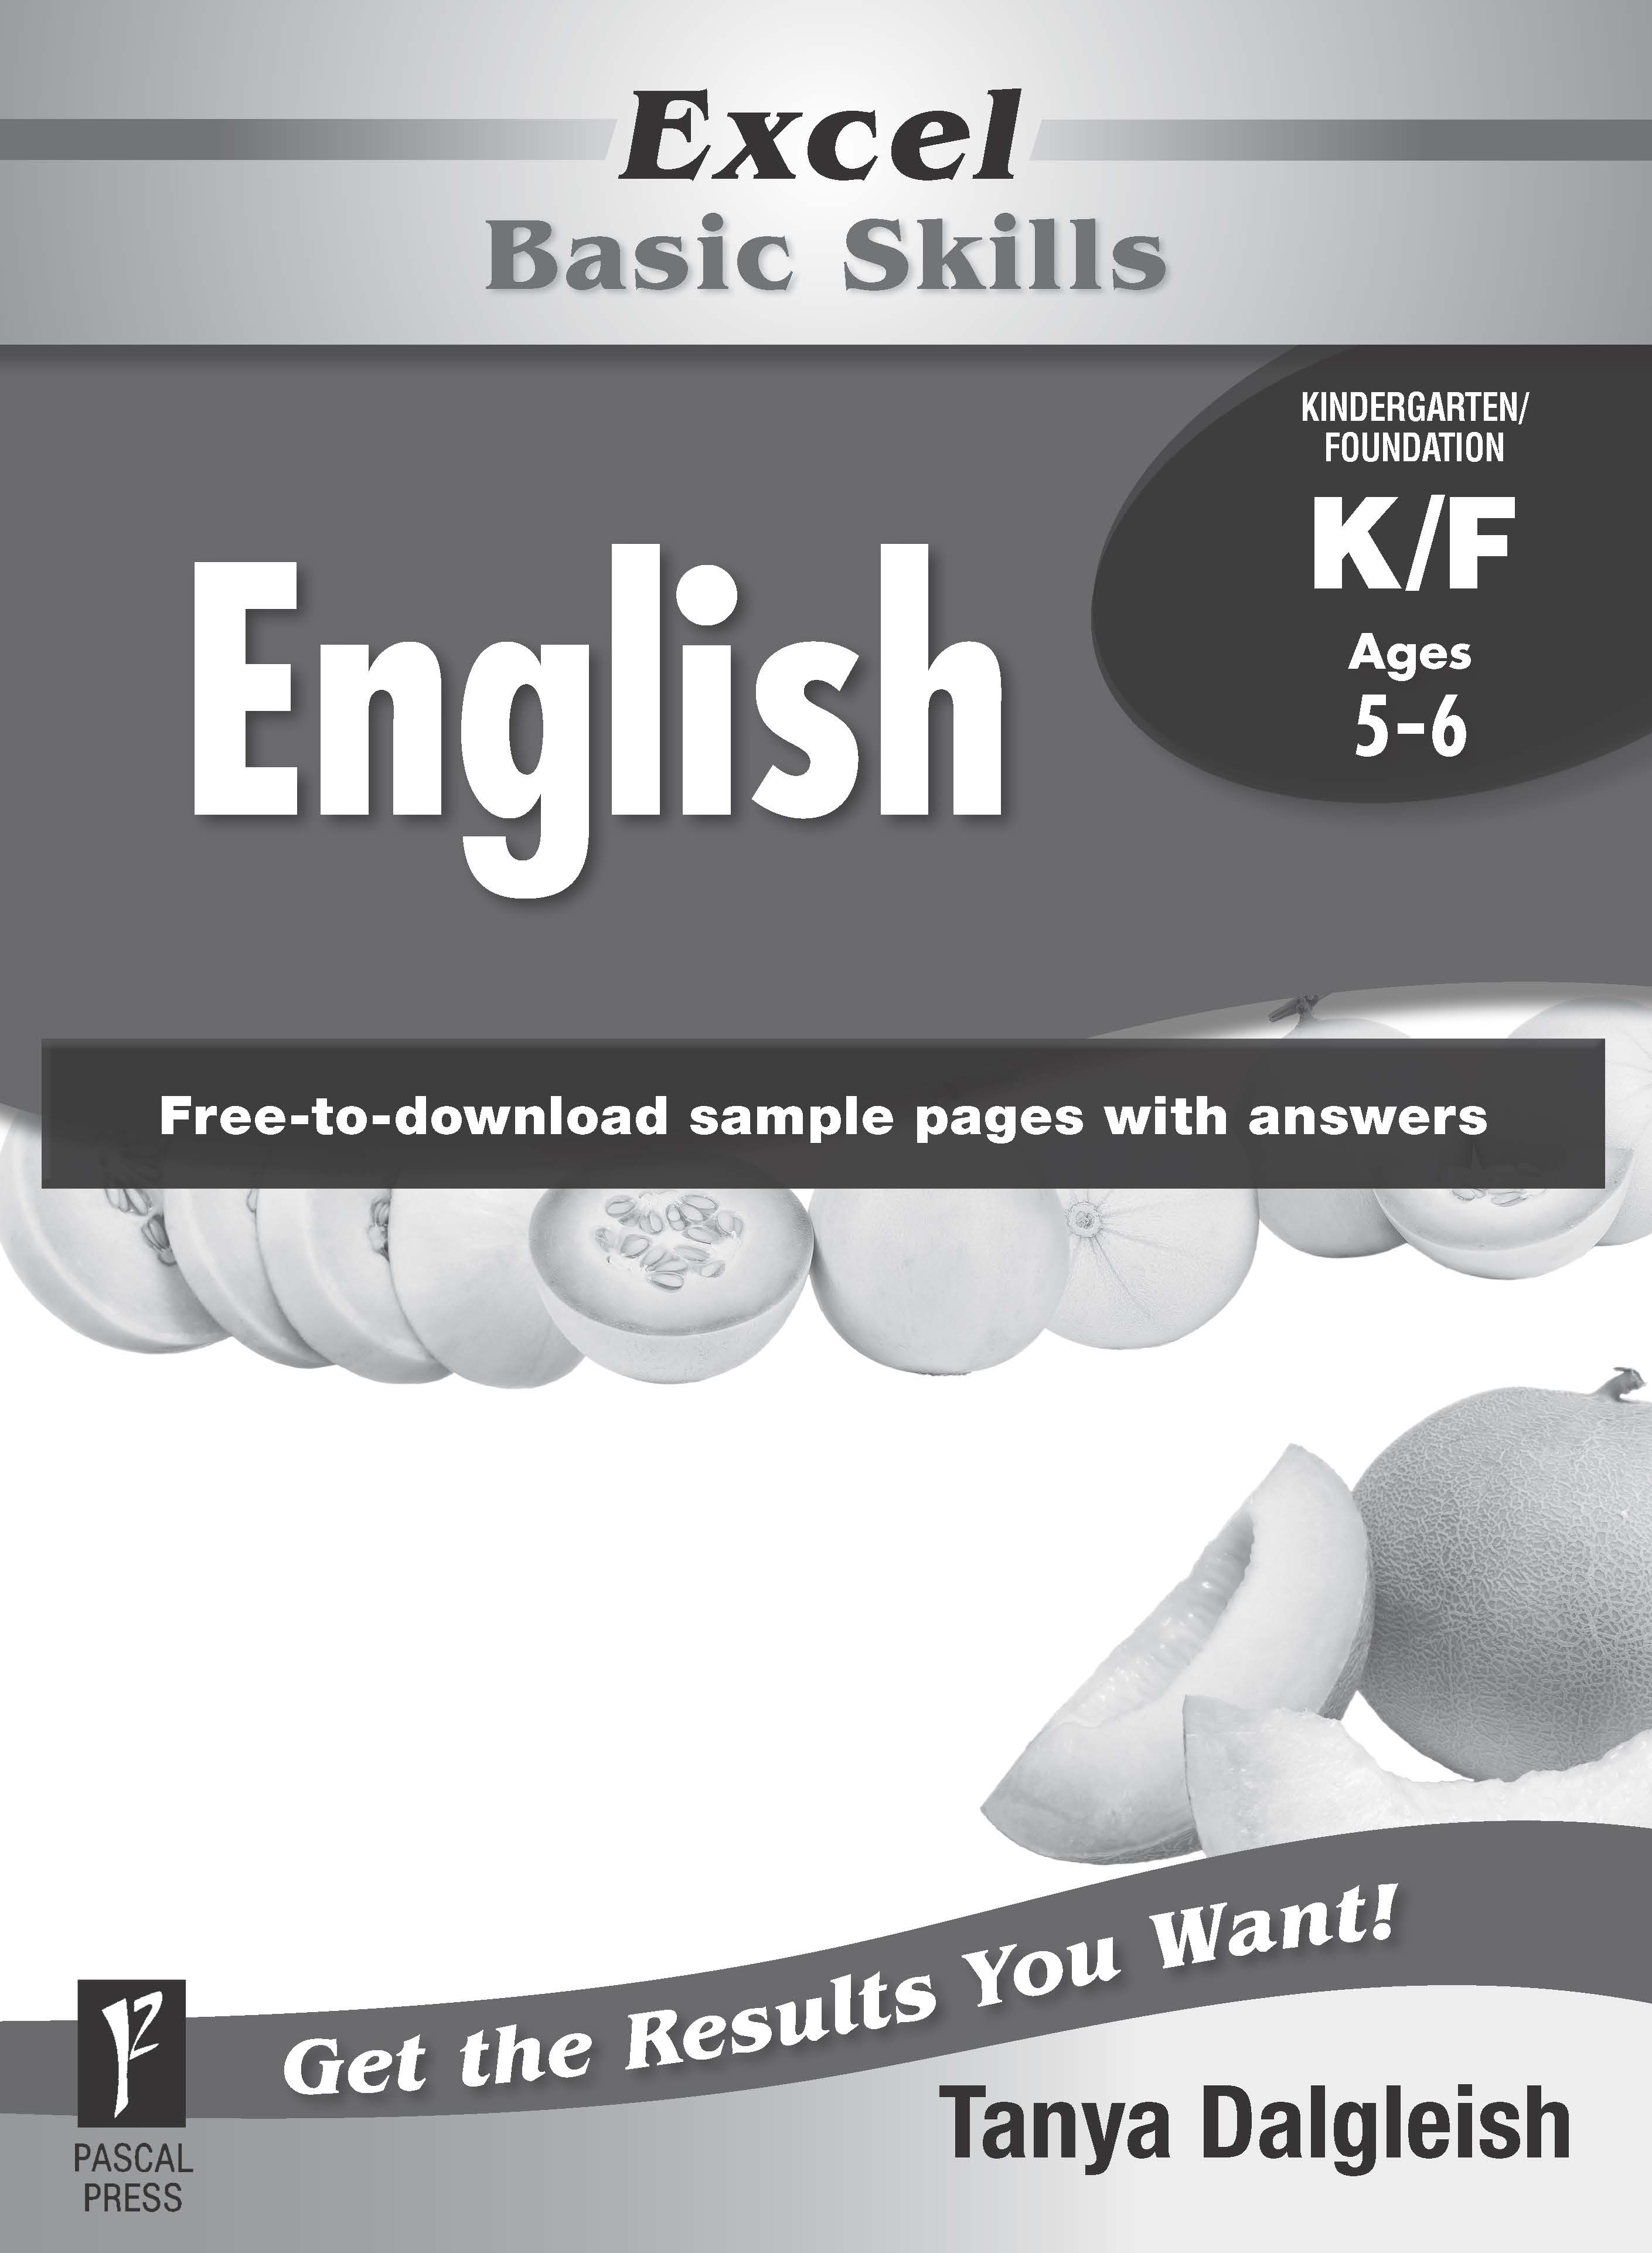 Excel Basic Skills English Kindergarten/Foundation